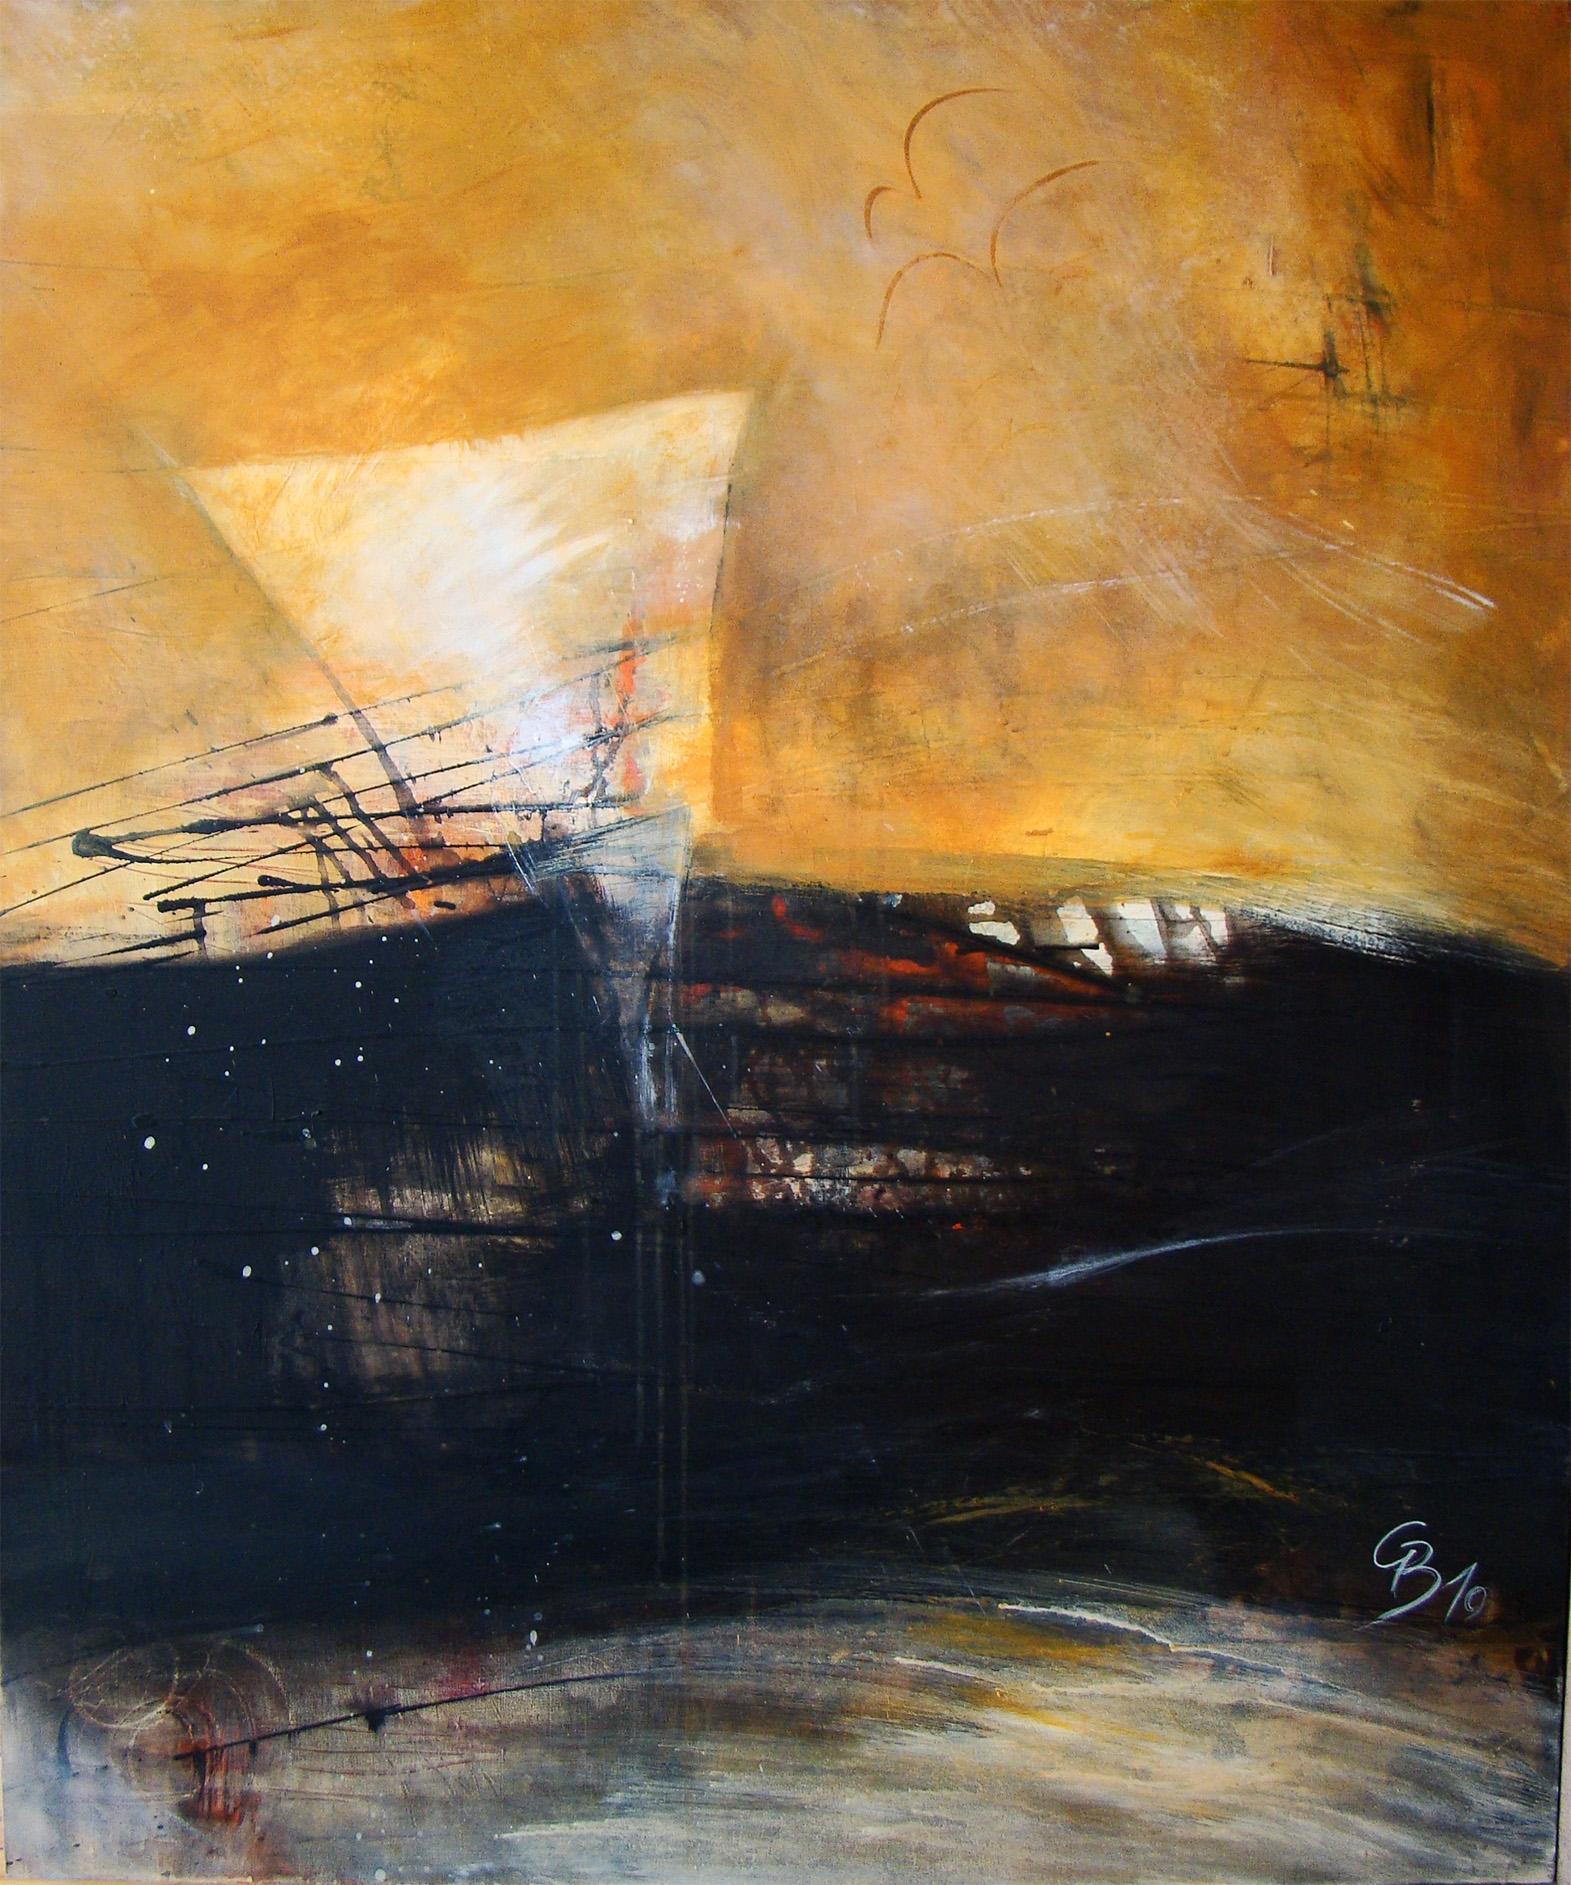 """EMOTIONAL"" Acryl, 100 x 120 cm"